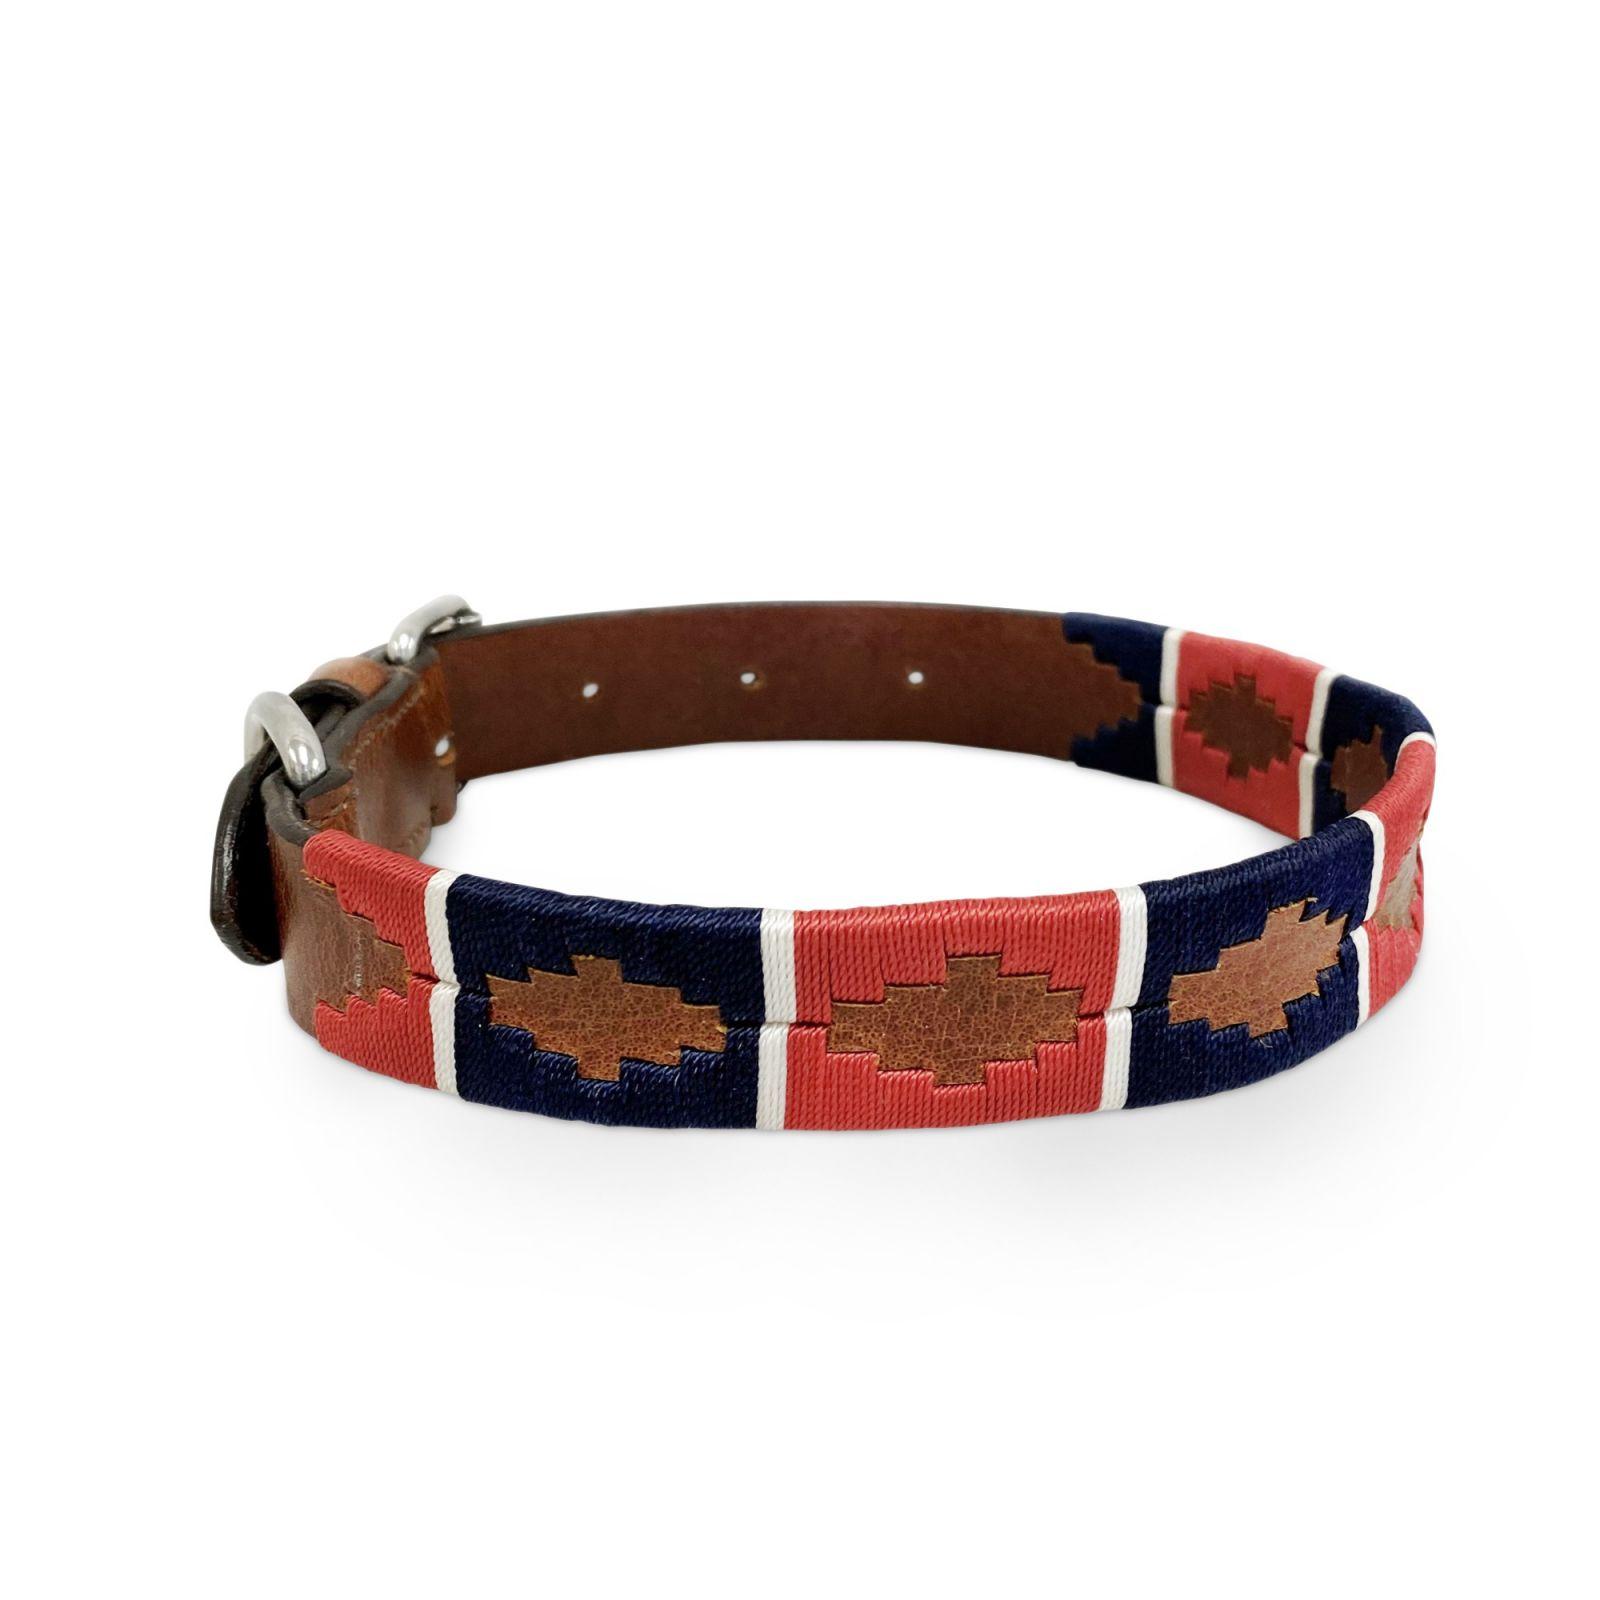 KM Elite Argentinian Dog Collar - Traditional